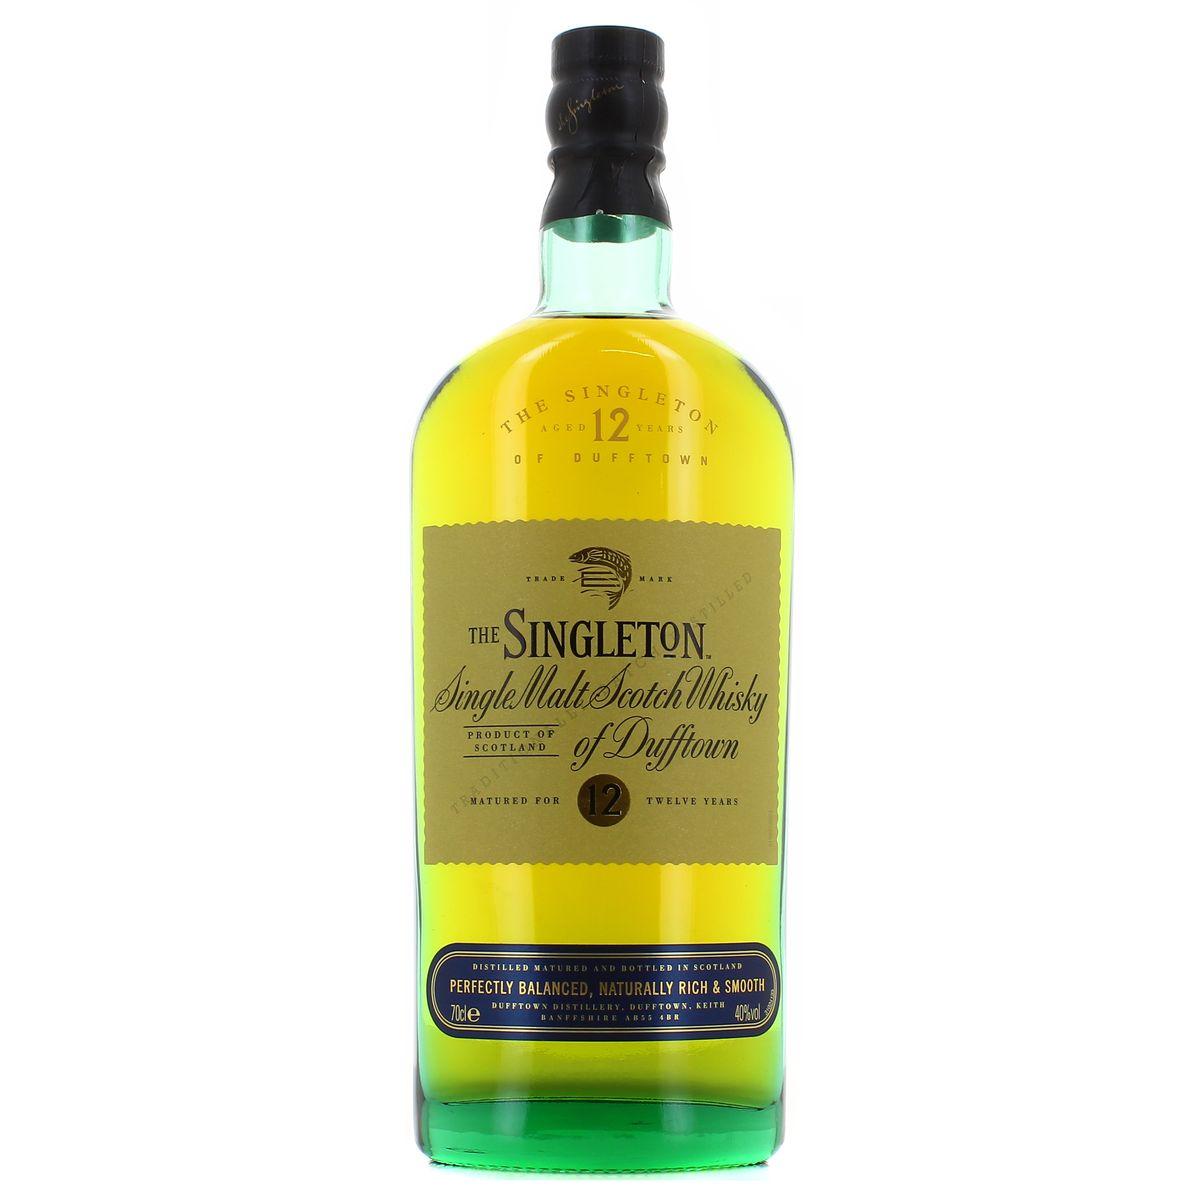 cea0f4eef8cf The Singleton Single malt scotch whisky 12 ans 40°, 70cl : houra.fr